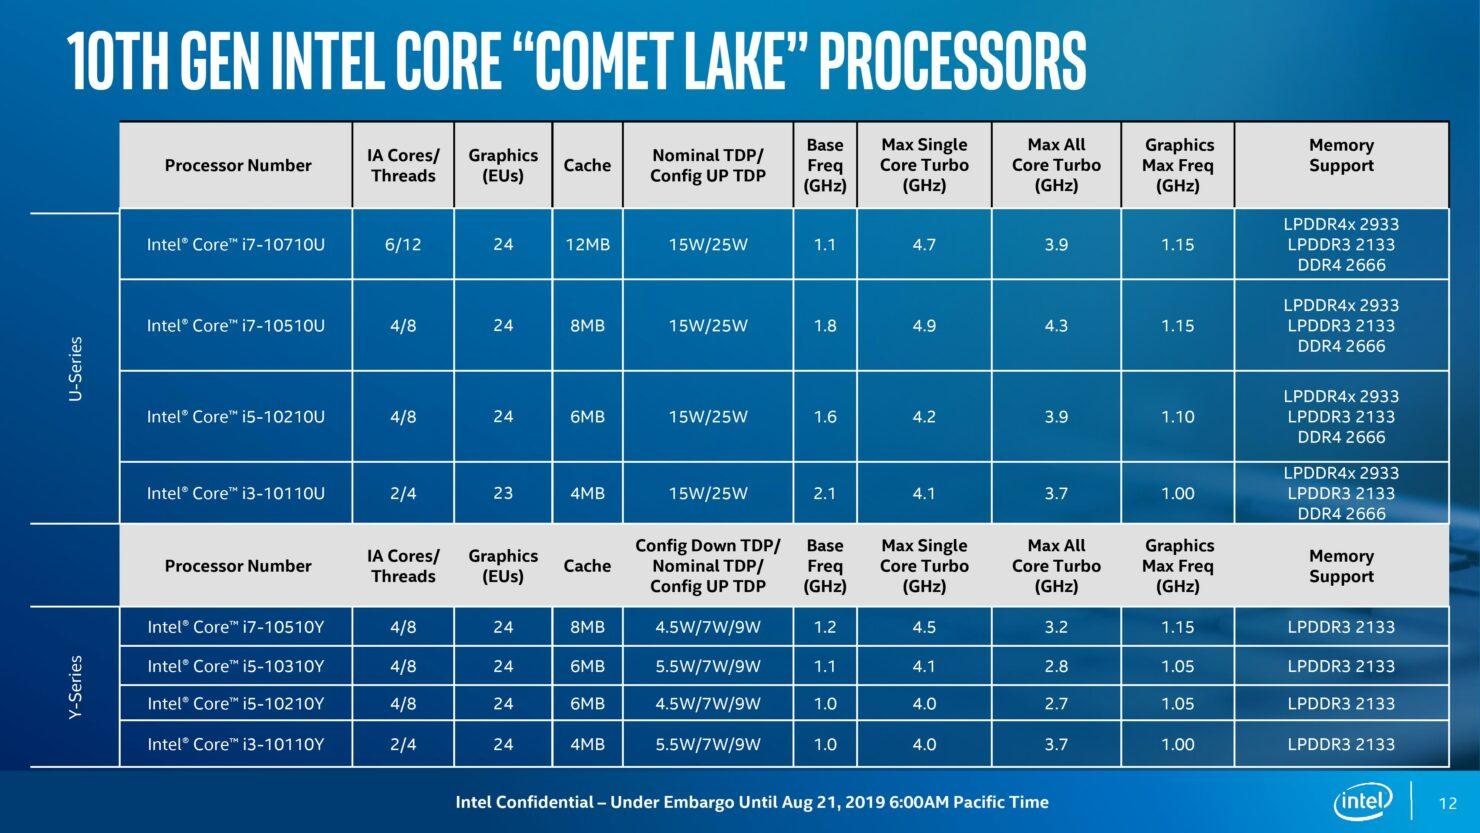 10th-gen-comet-lake_under-embargo-until-aug-21-2019-600-am-pt2-page-012